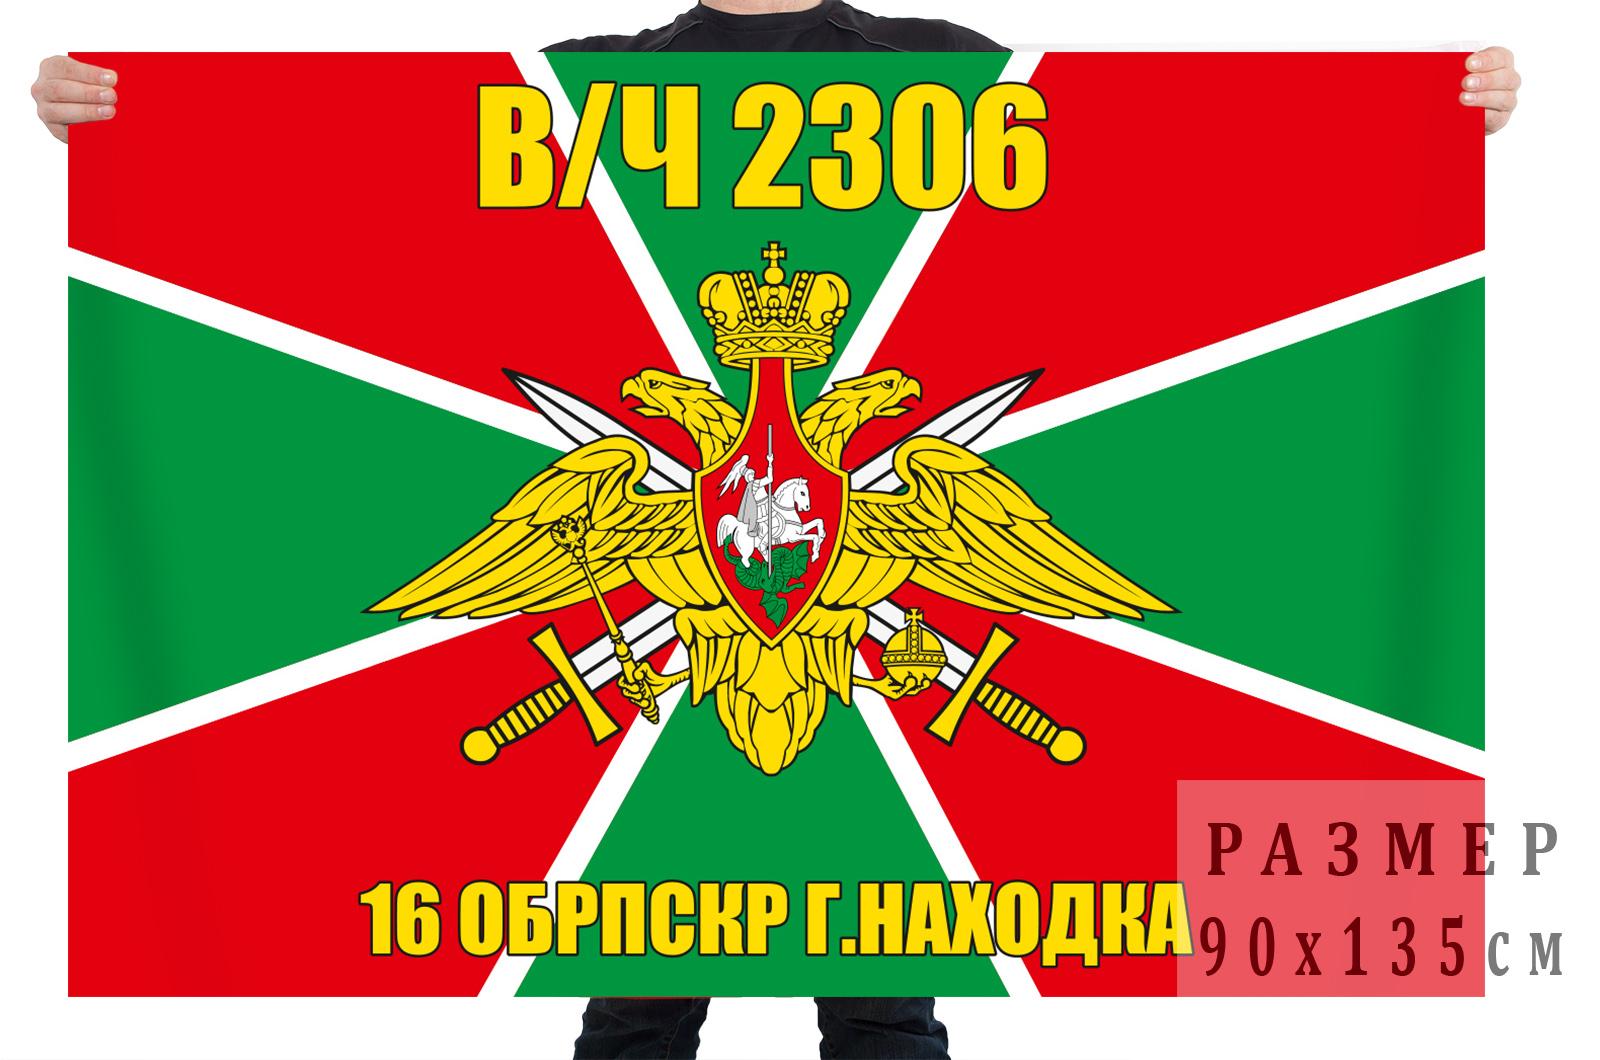 Флаг МЧПВ 16 ОБрПСКР г. Находка, в/ч 2306